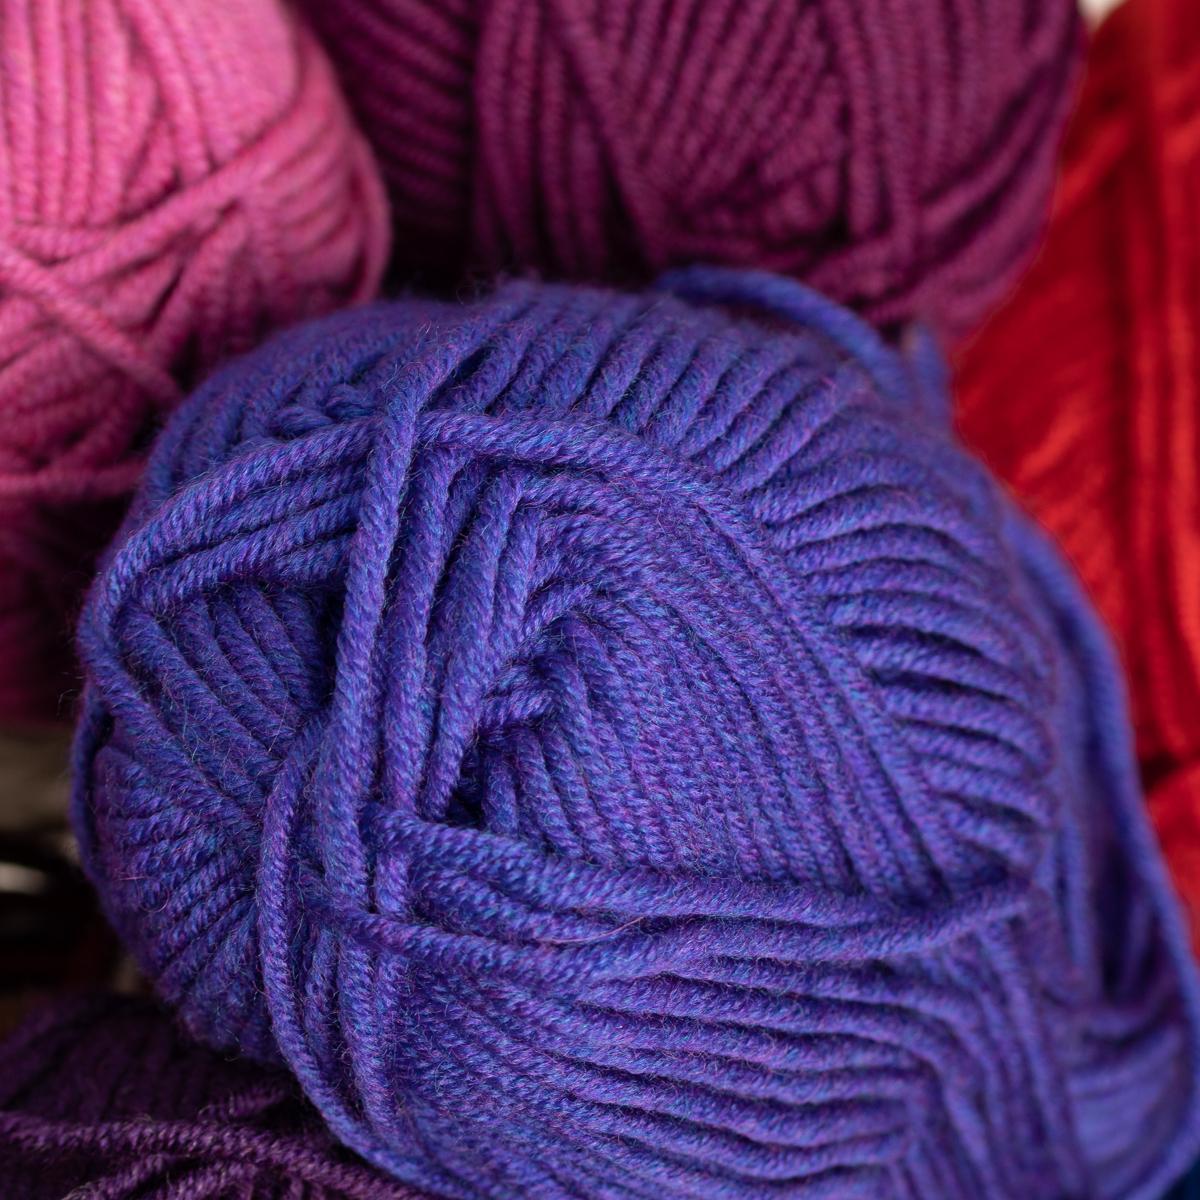 3pk-Lion-Brand-Woolspun-Acrylic-amp-Wool-Yarn-Bulky-5-Knit-Crocheting-Skeins-Soft thumbnail 110